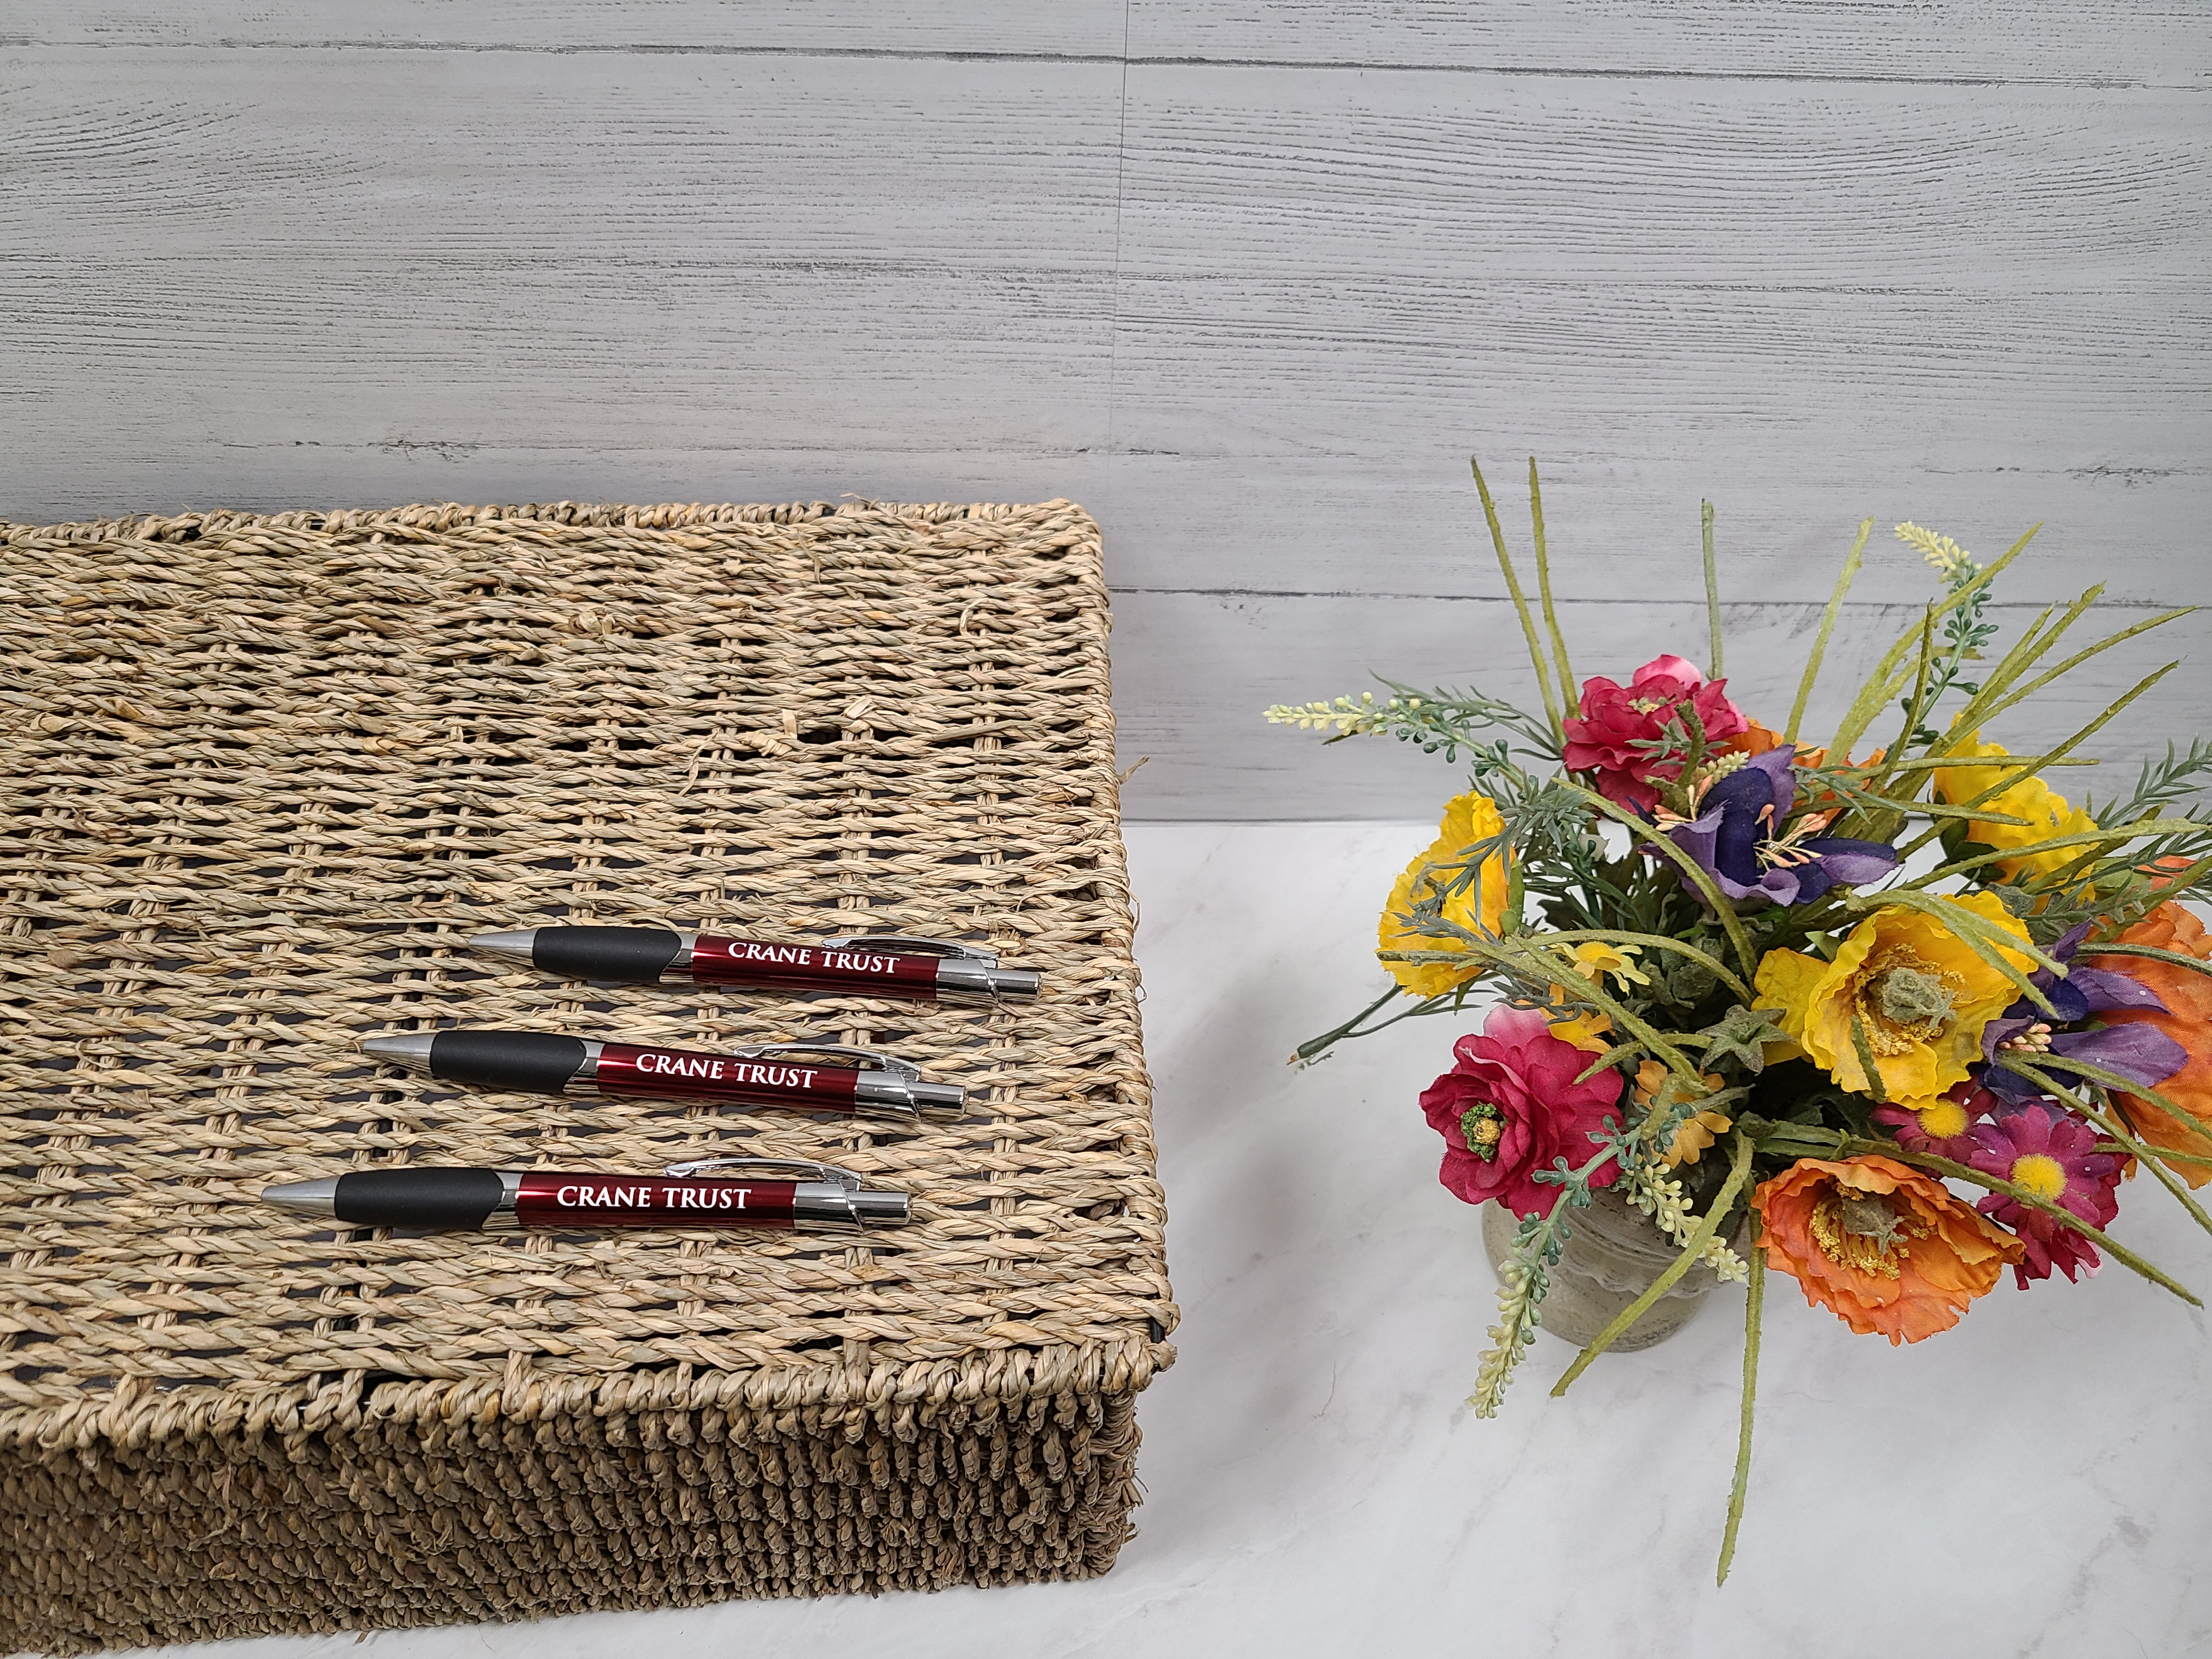 Writing Pen with Crane Trust